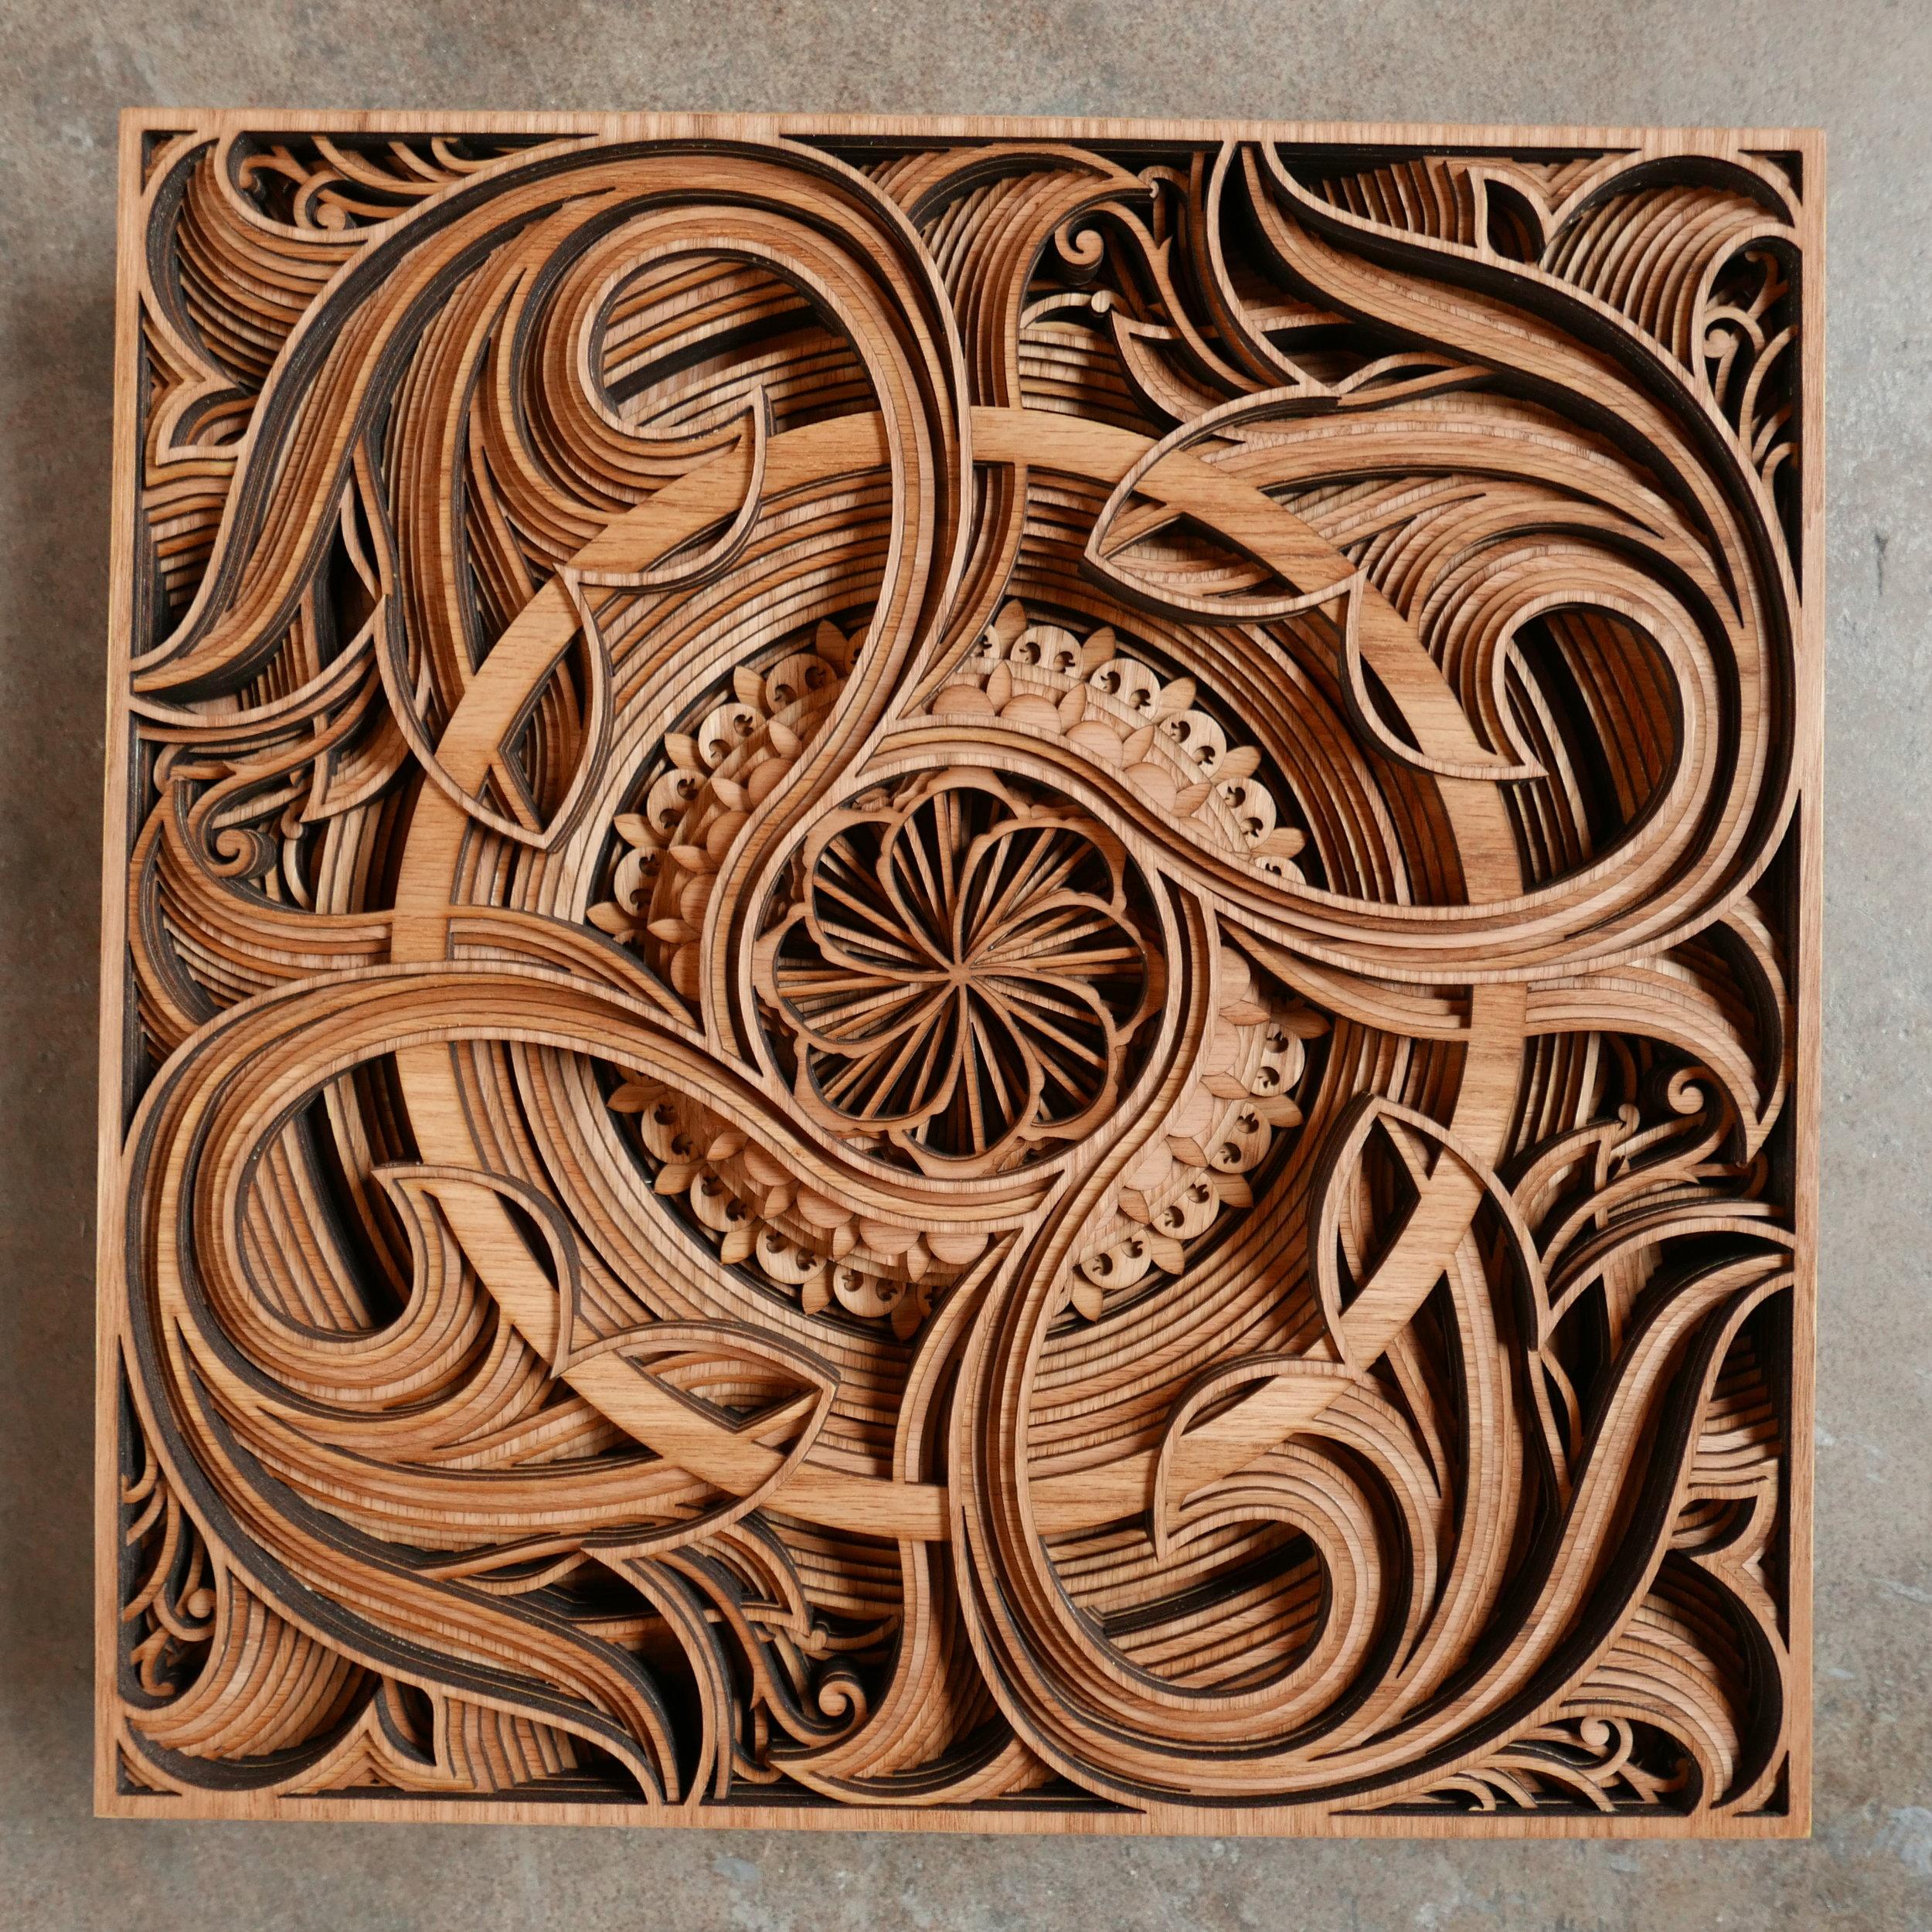 "DEMETER    17"" x 17"" red oak plywood 2017"